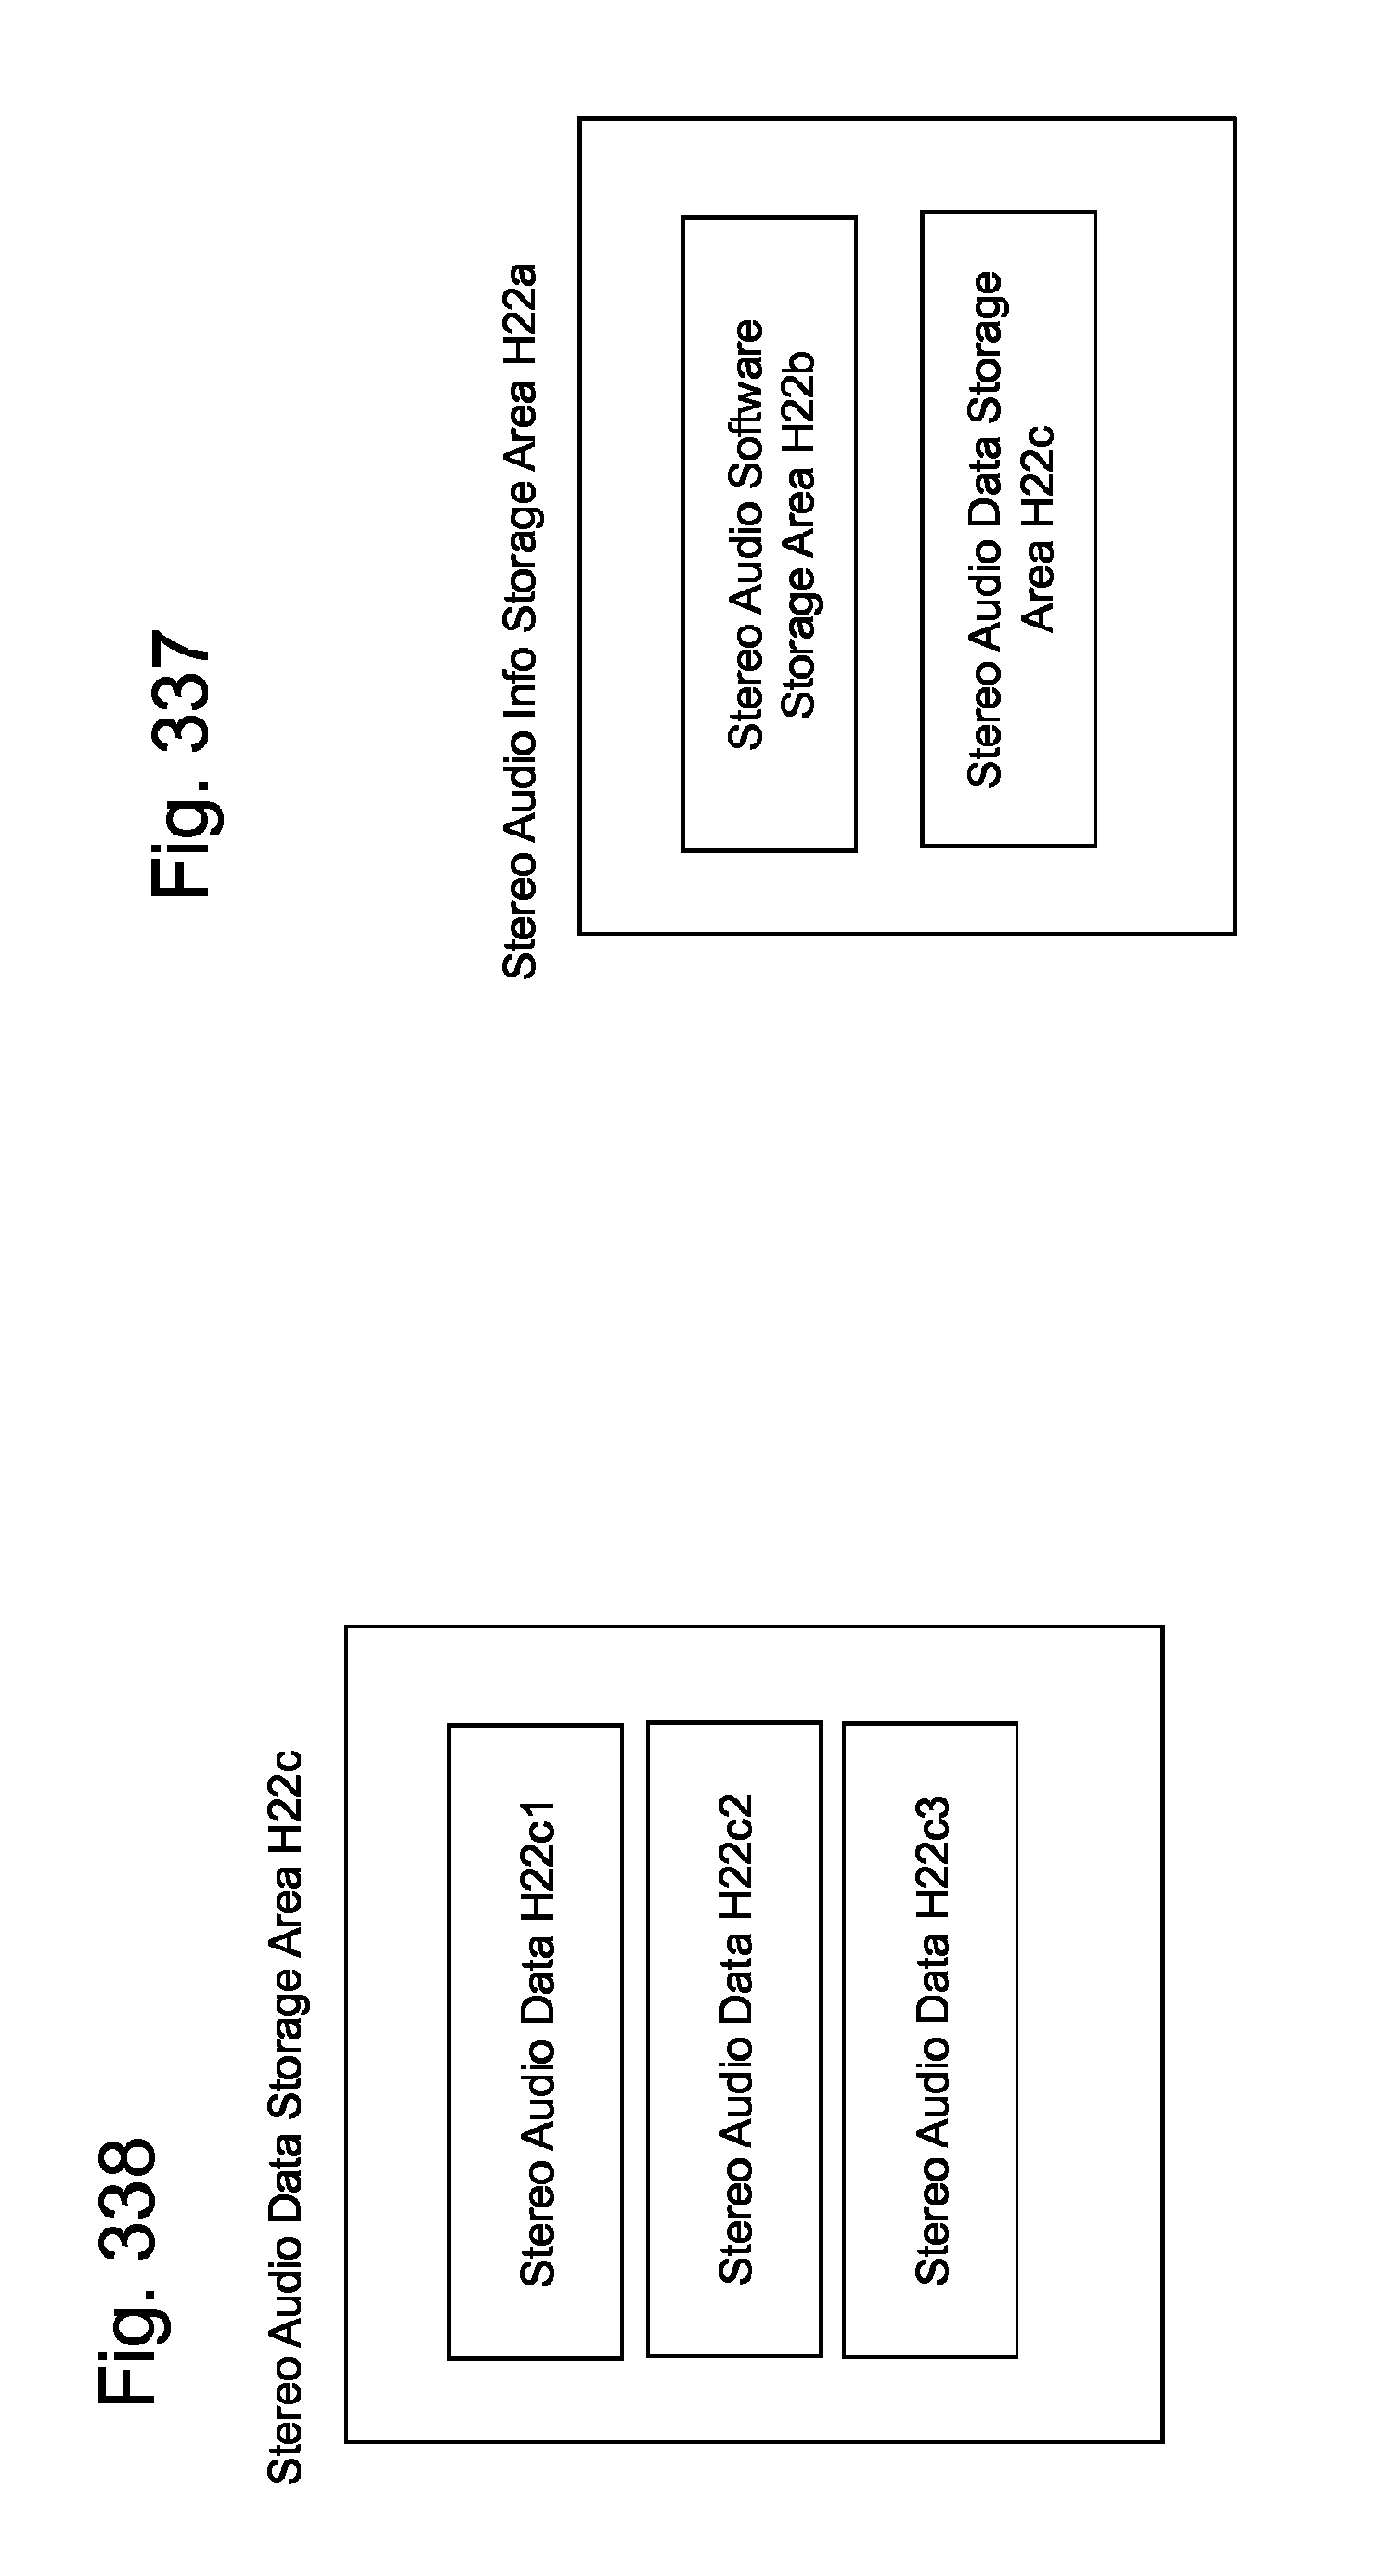 Patent US 8,150,458 B1